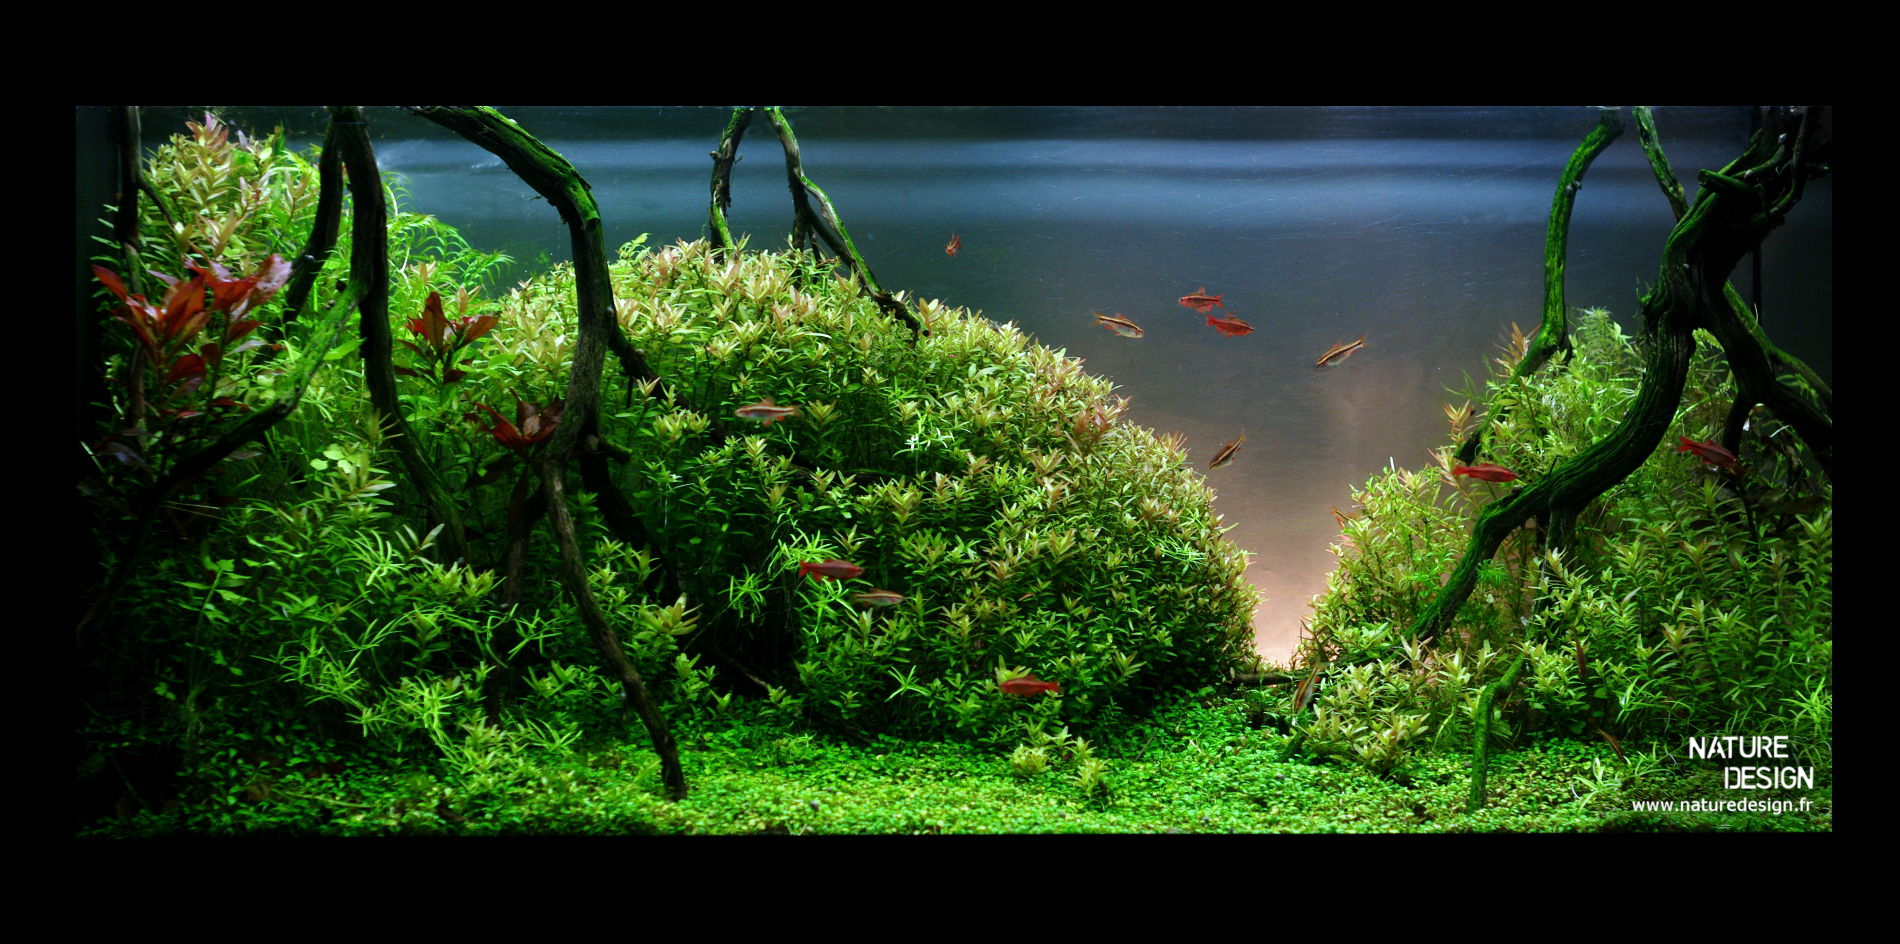 ... vegetalise en symbiose avec un aquarium sur mesure. Naturedesign.fr